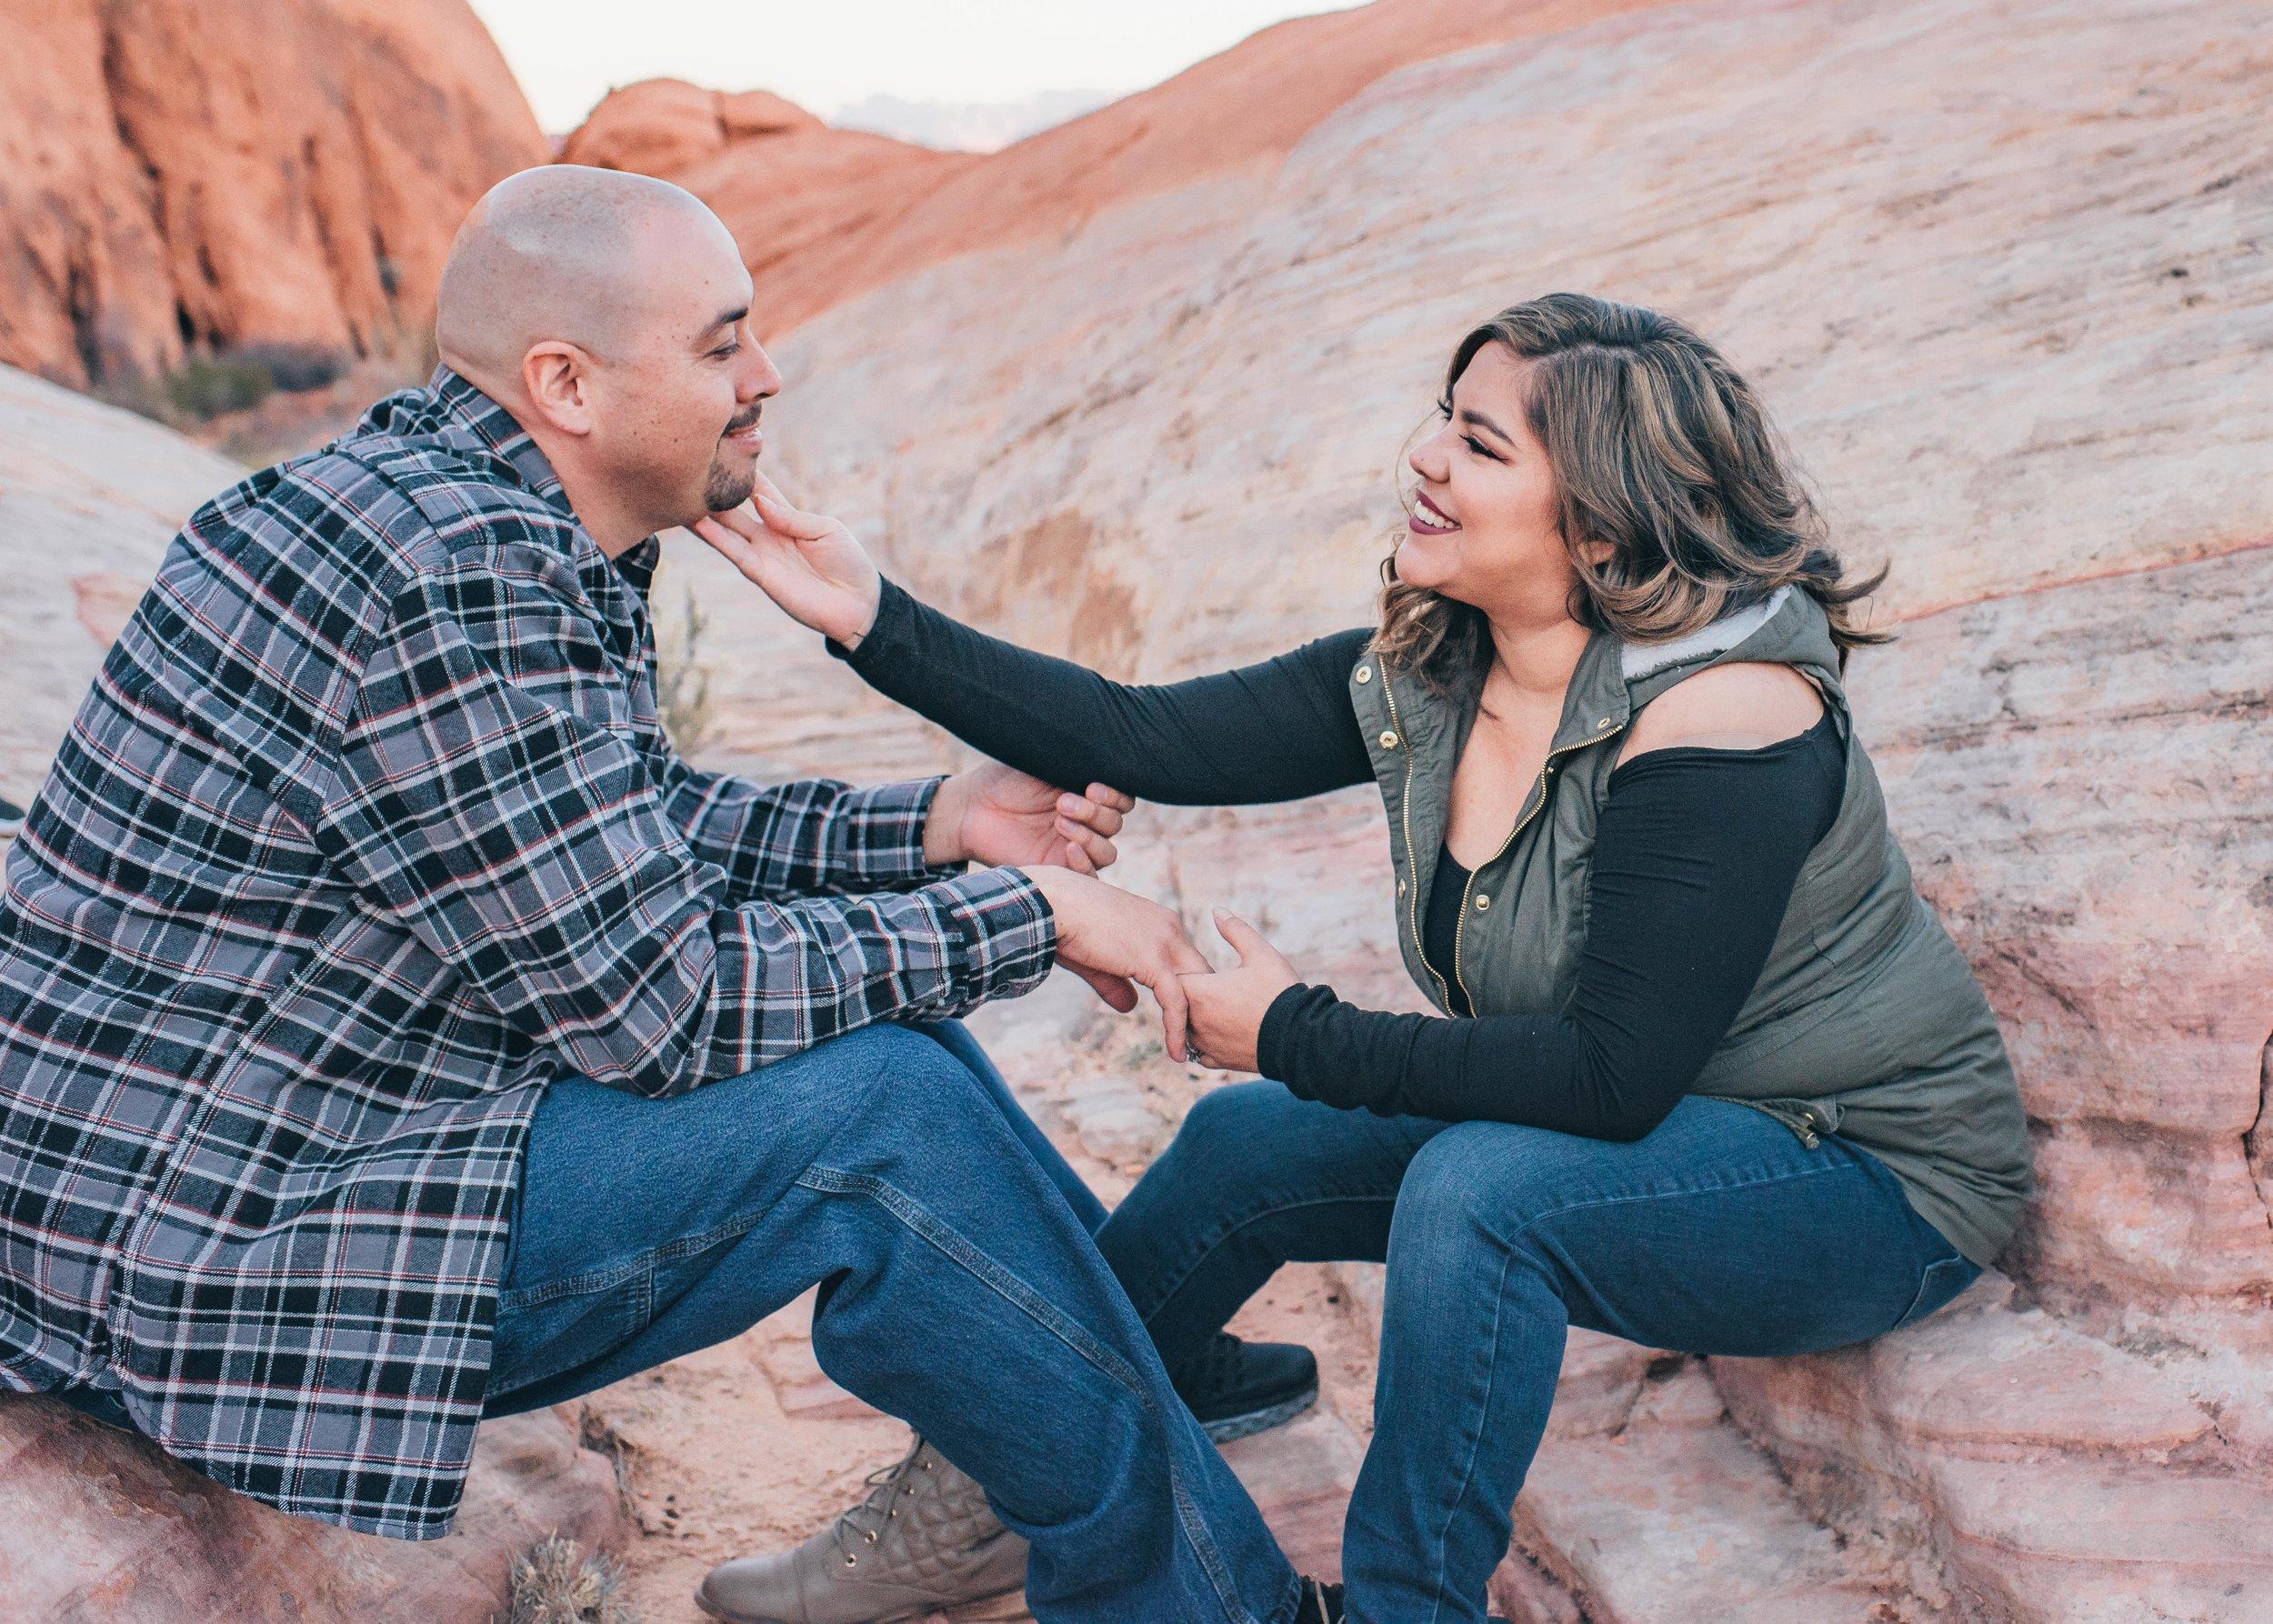 Valley of Fire Wedding Photographer, Elopement Photographer, Engagement Photographer, Los Angeles Wedding Photographer, Palm Springs Wedding Photographer, Joshua Tree Wedding Photographer